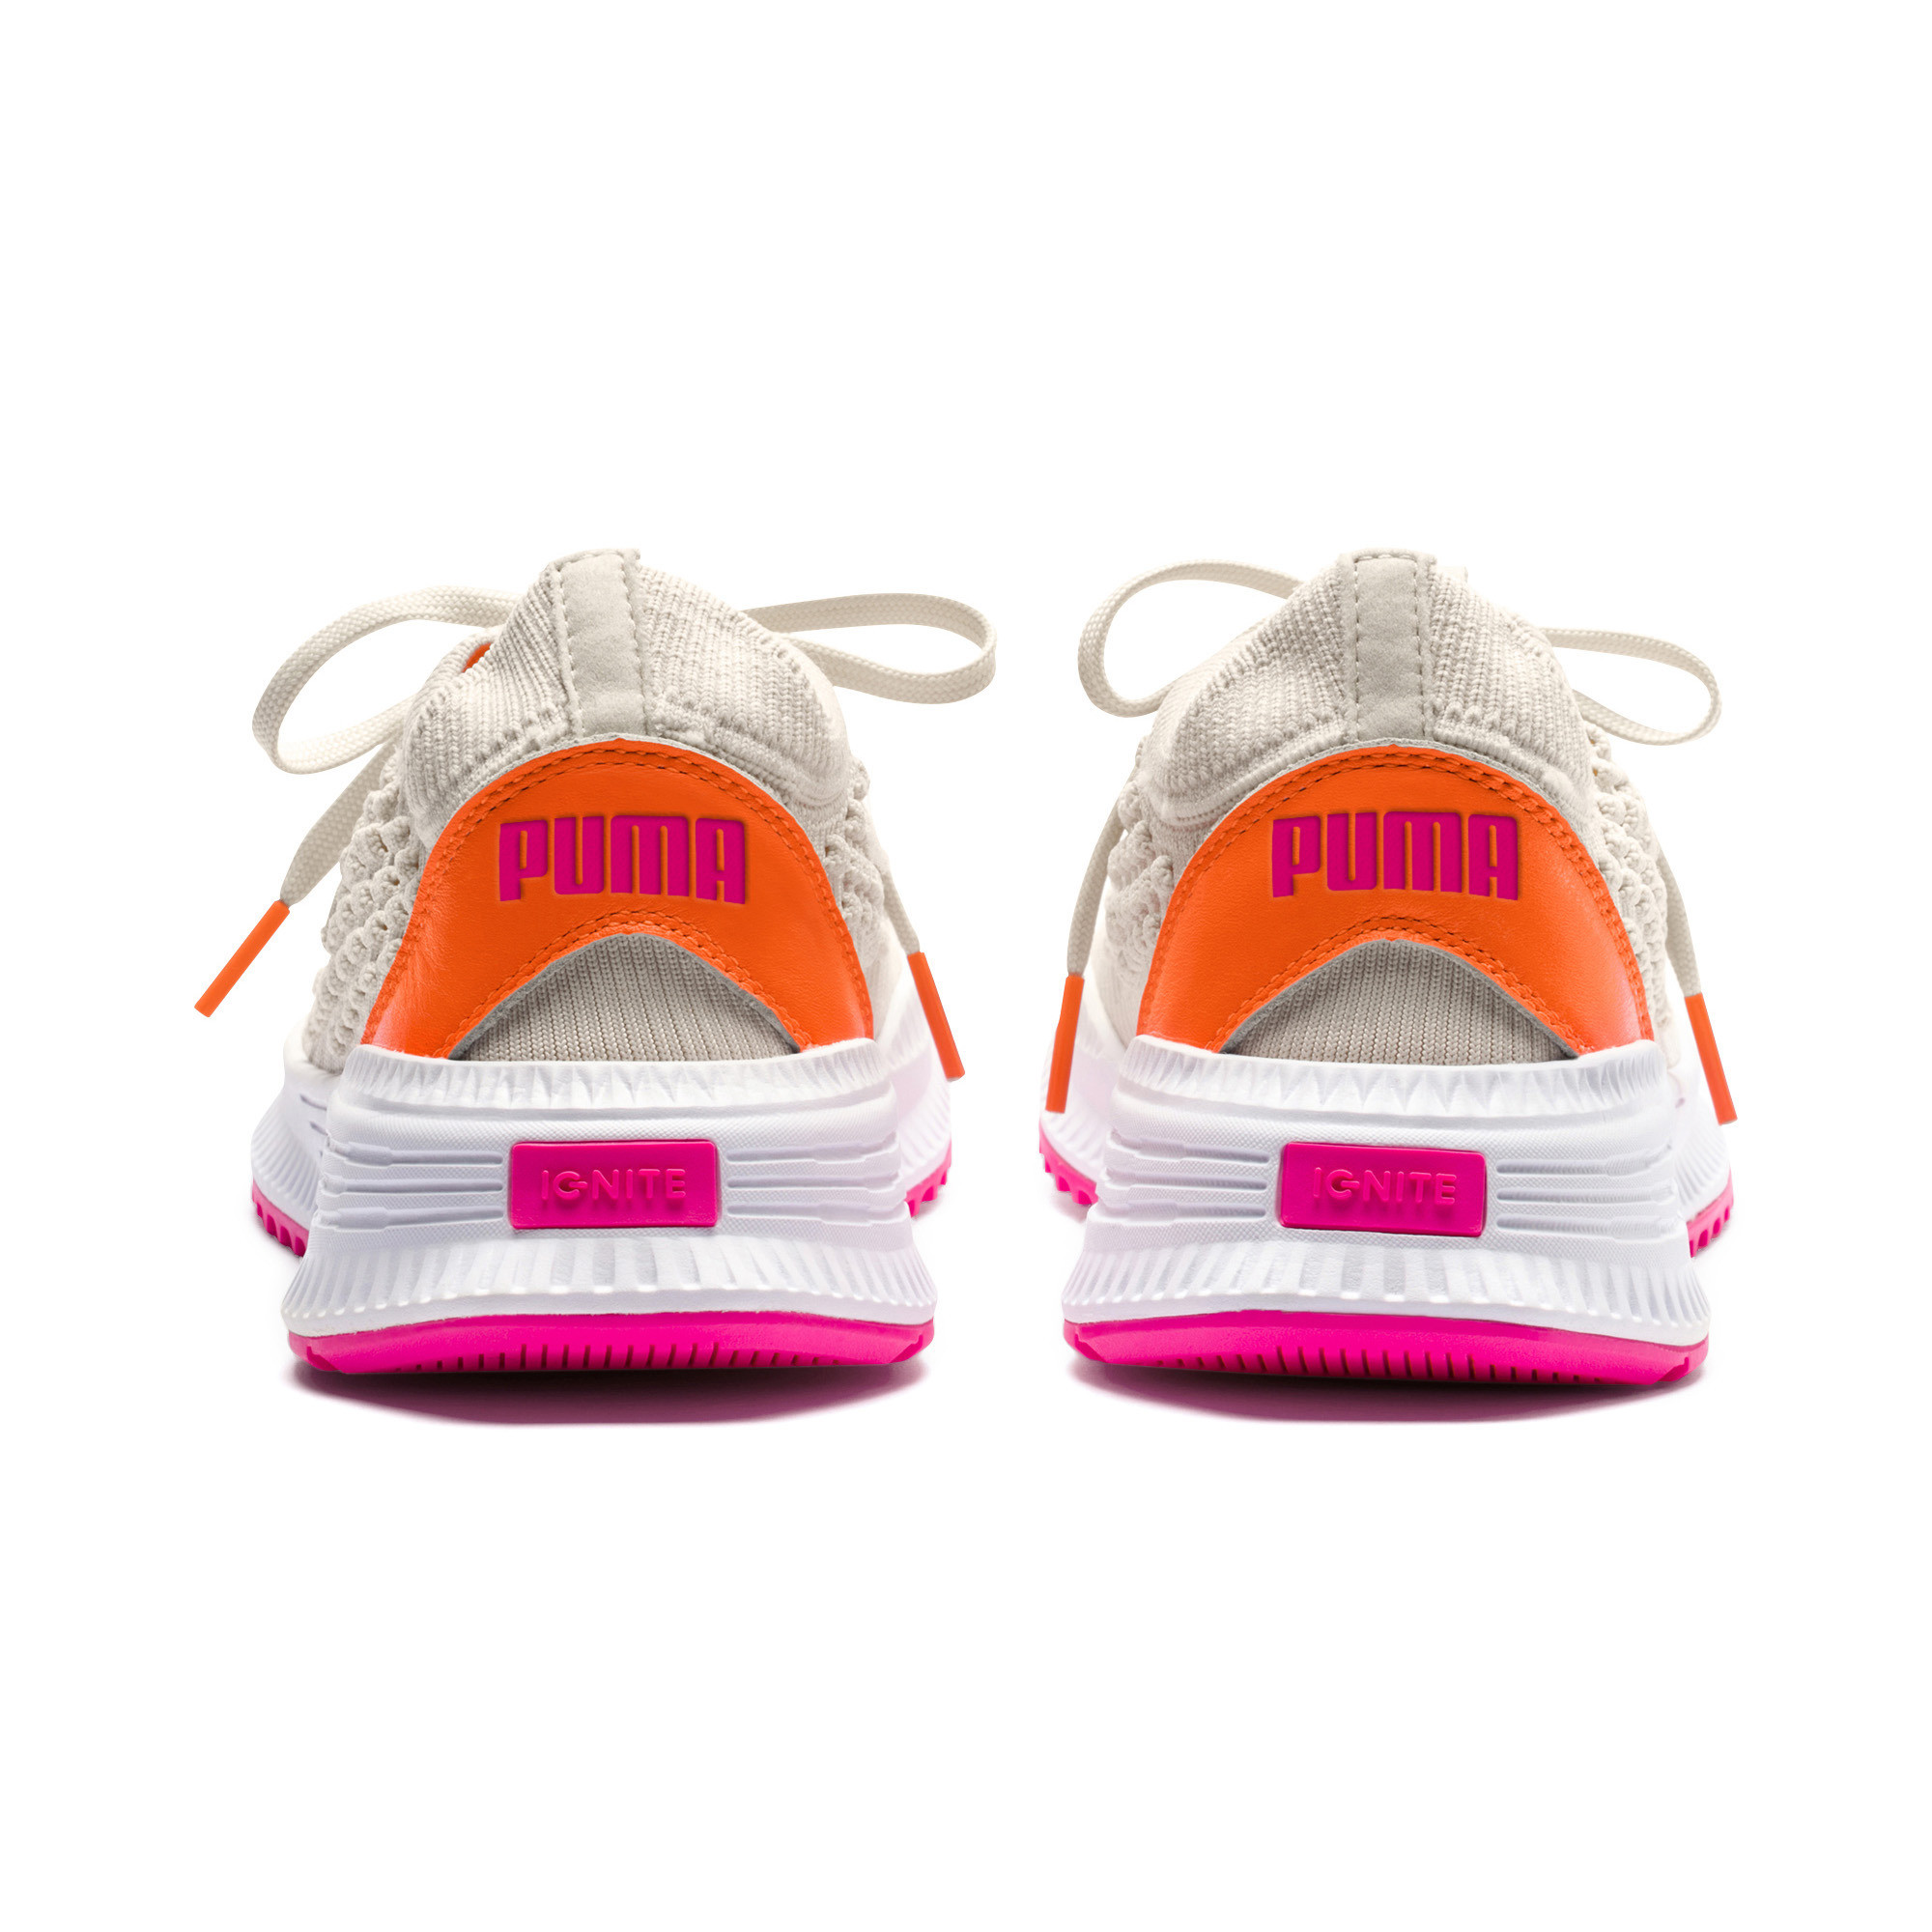 455846ae26 Evolution AVID FUSEFIT Men's Sneakers | 100 - Beige | Puma